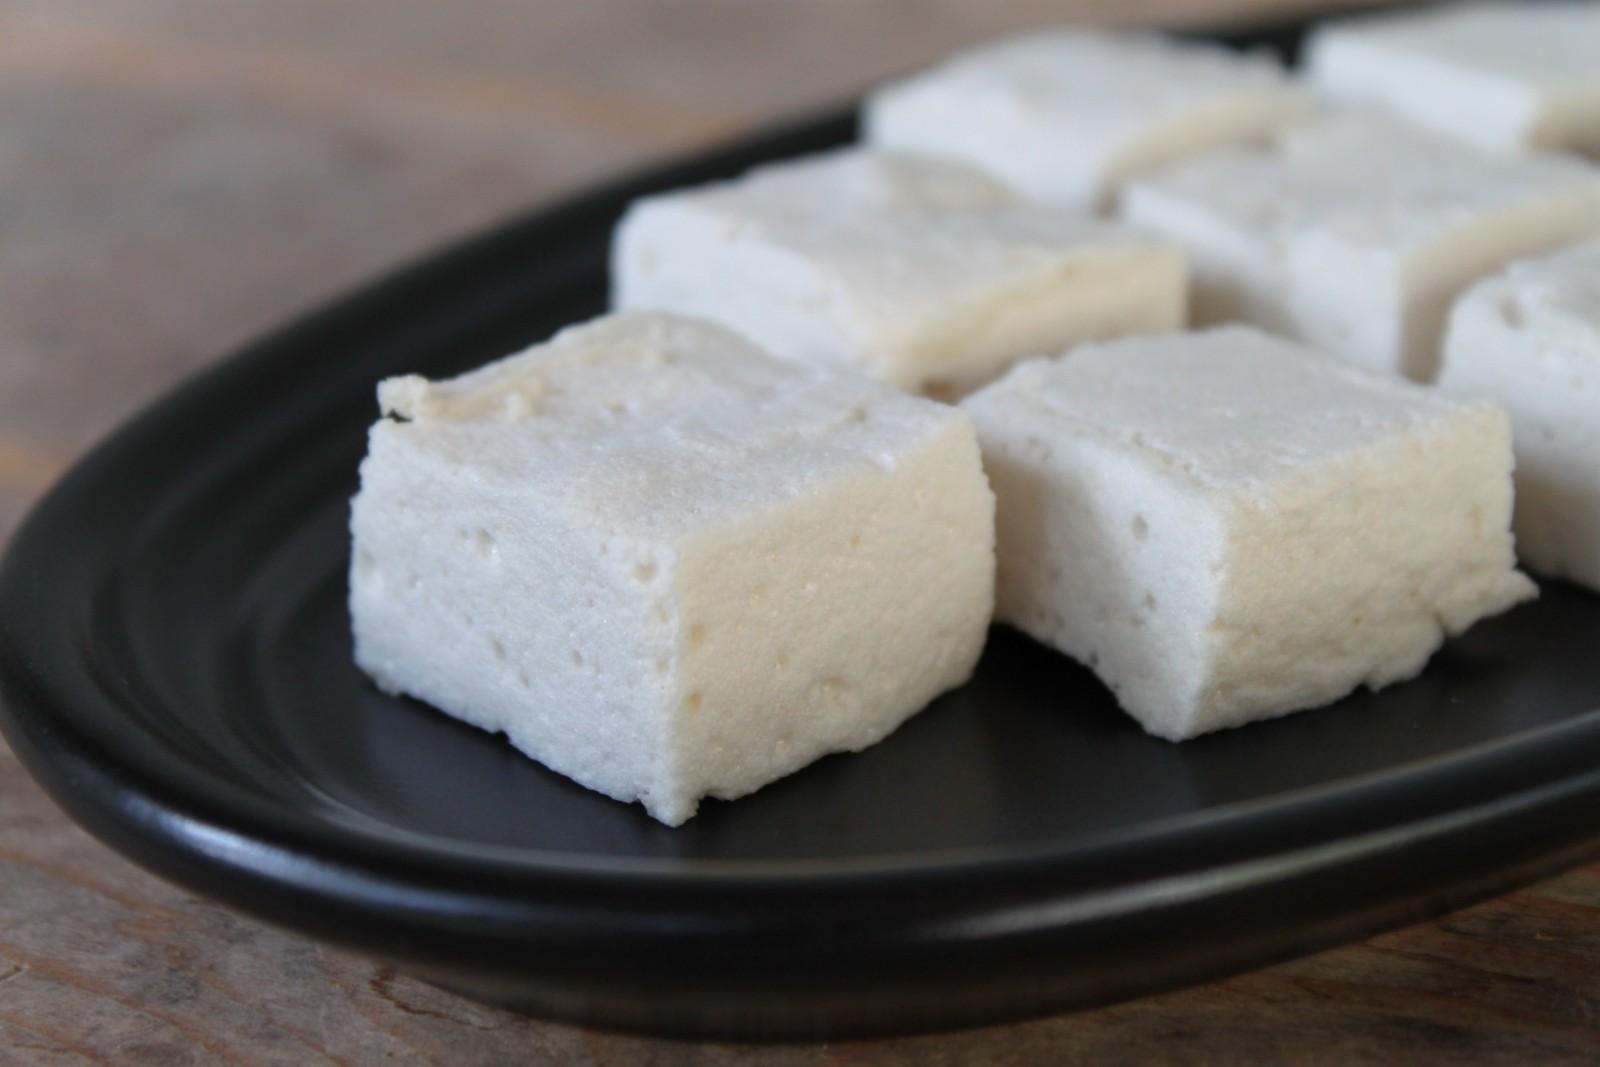 Homemade Honey-Sweetened Marshmallows